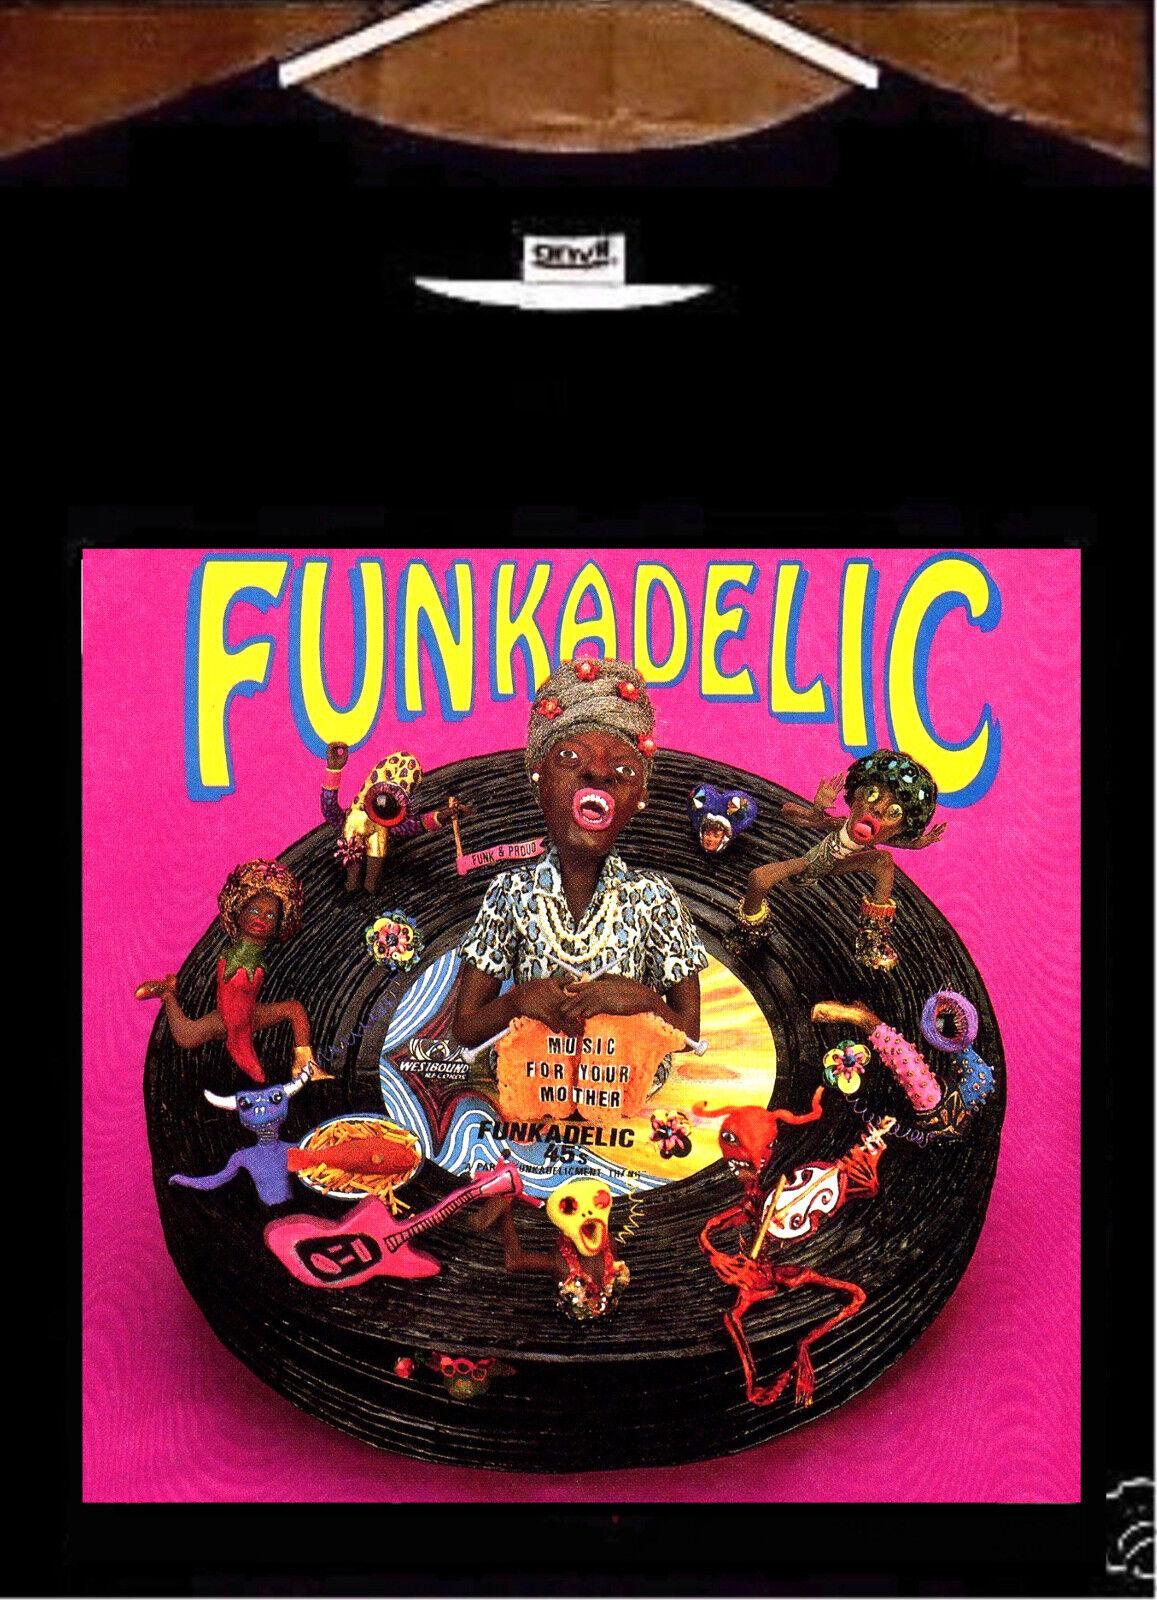 56f6ba12ec92 Funkadelic T Who s Your Tee Shirt Mother shirt  ovpocr10478-T-Shirts ...